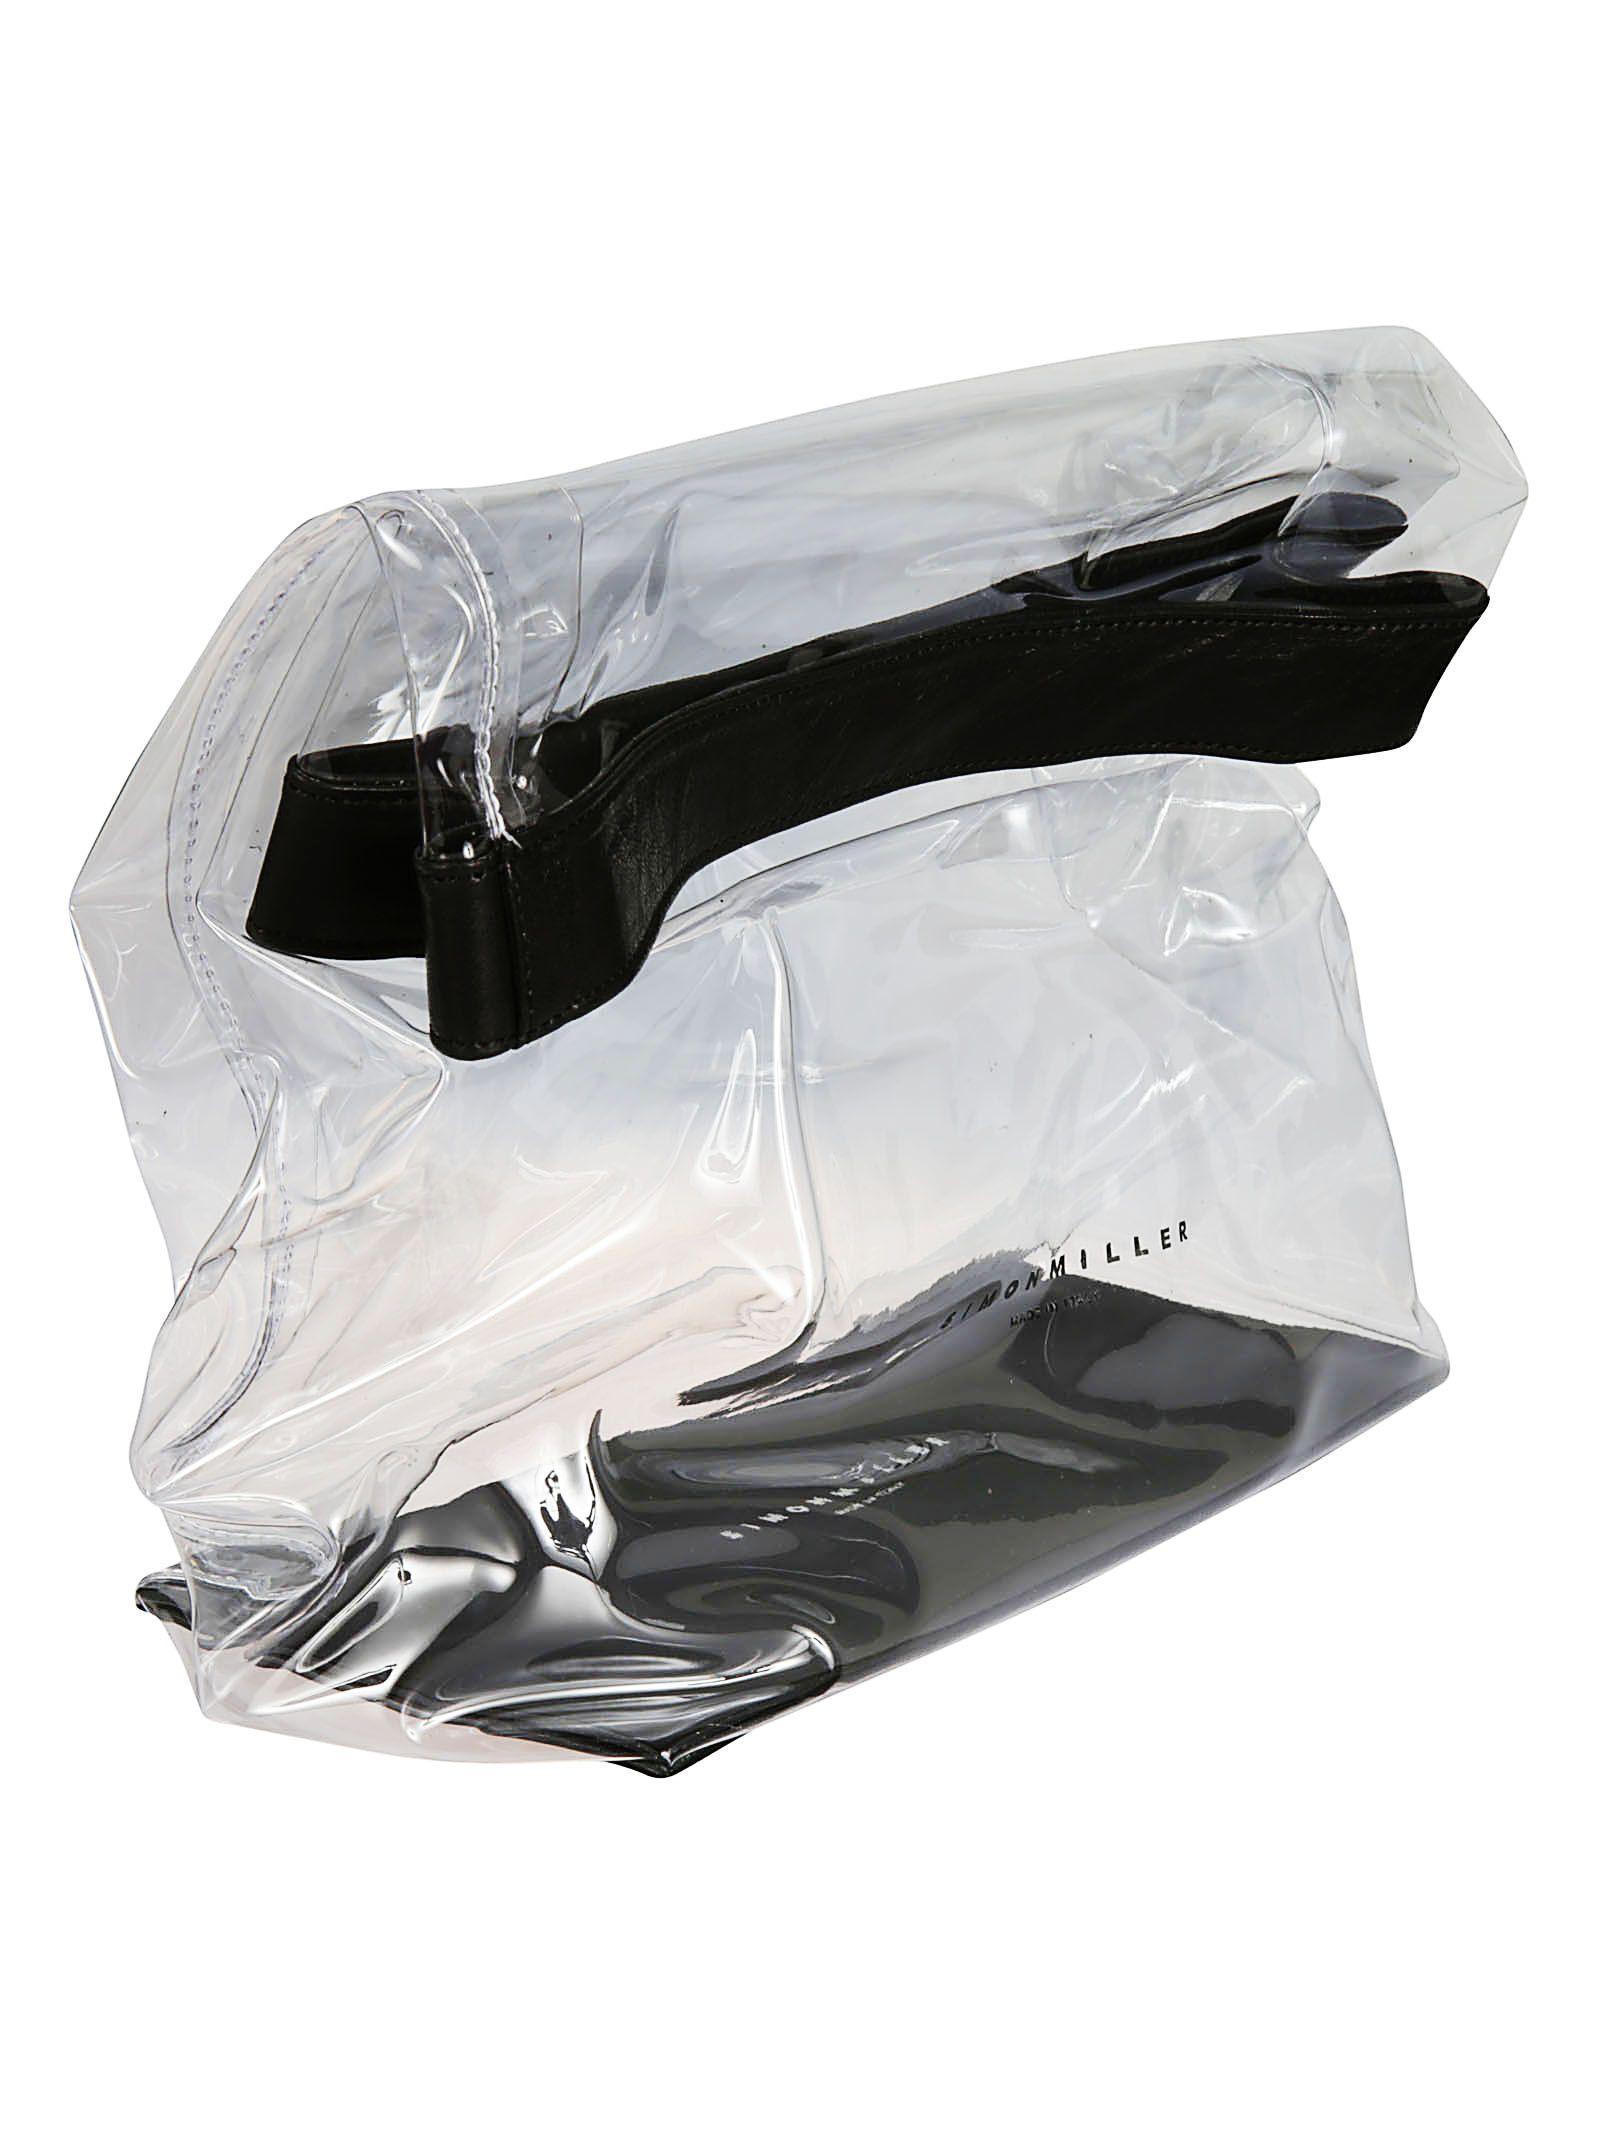 SIMON MILLER WOMEN'S S810901110027 WHITE PVC POUCH